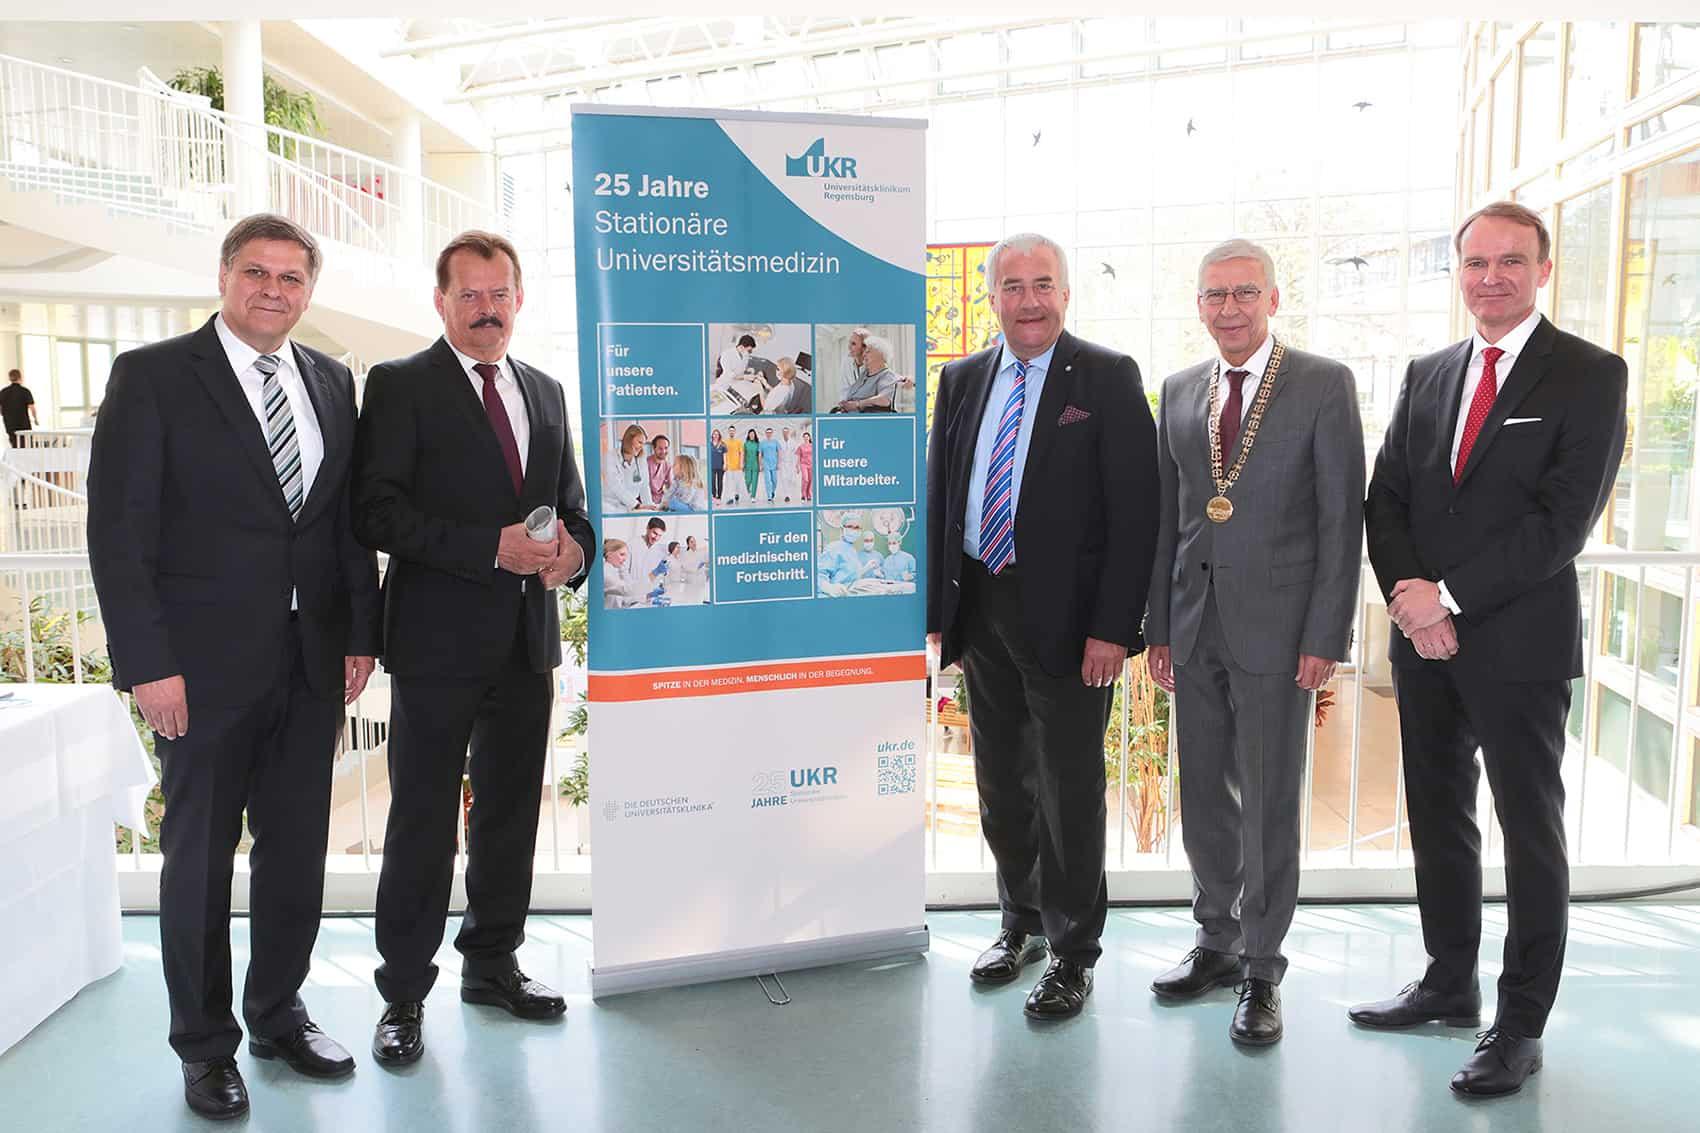 Festakt 25 Jahre stationäre Universitätsmedizin für Ostbayern am UKR